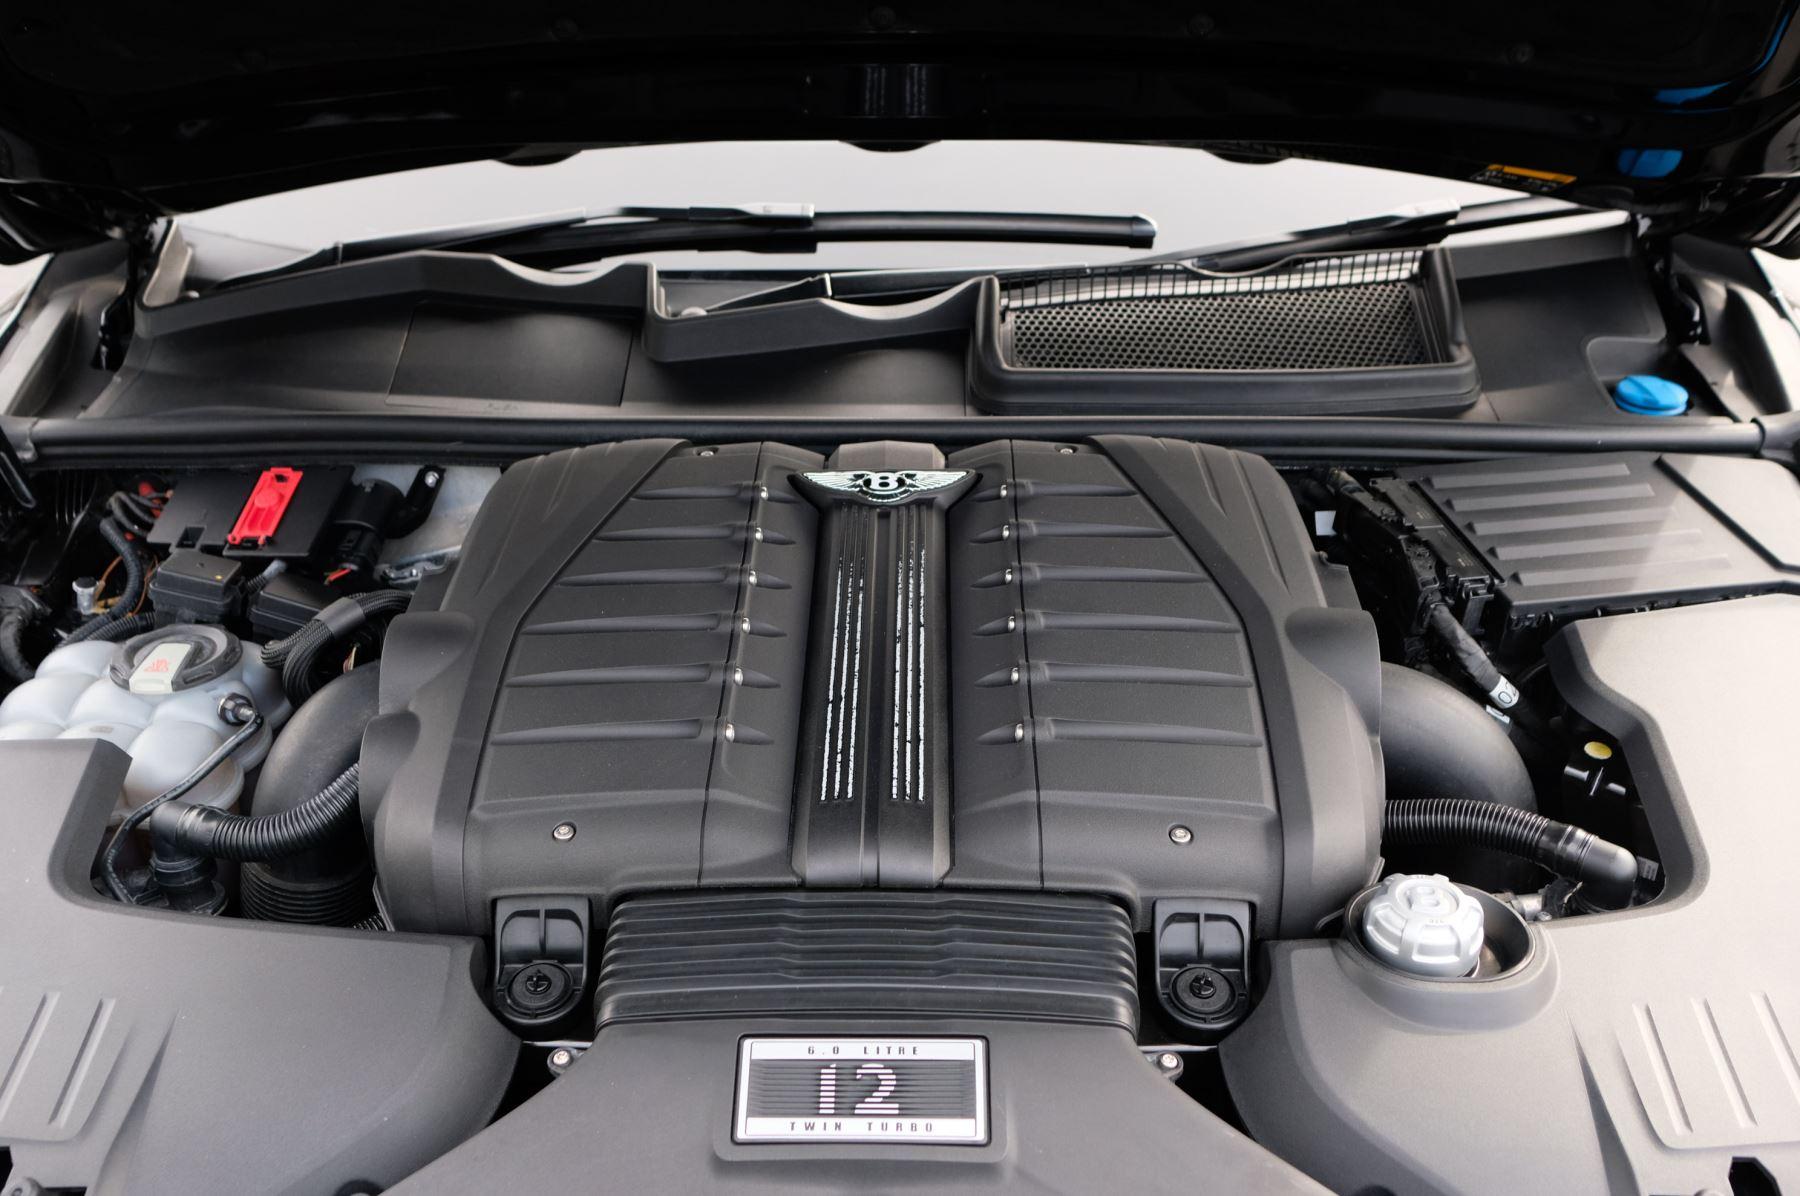 Bentley Bentayga 6.0 W12 5dr - Mulliner Driving Specification  image 10